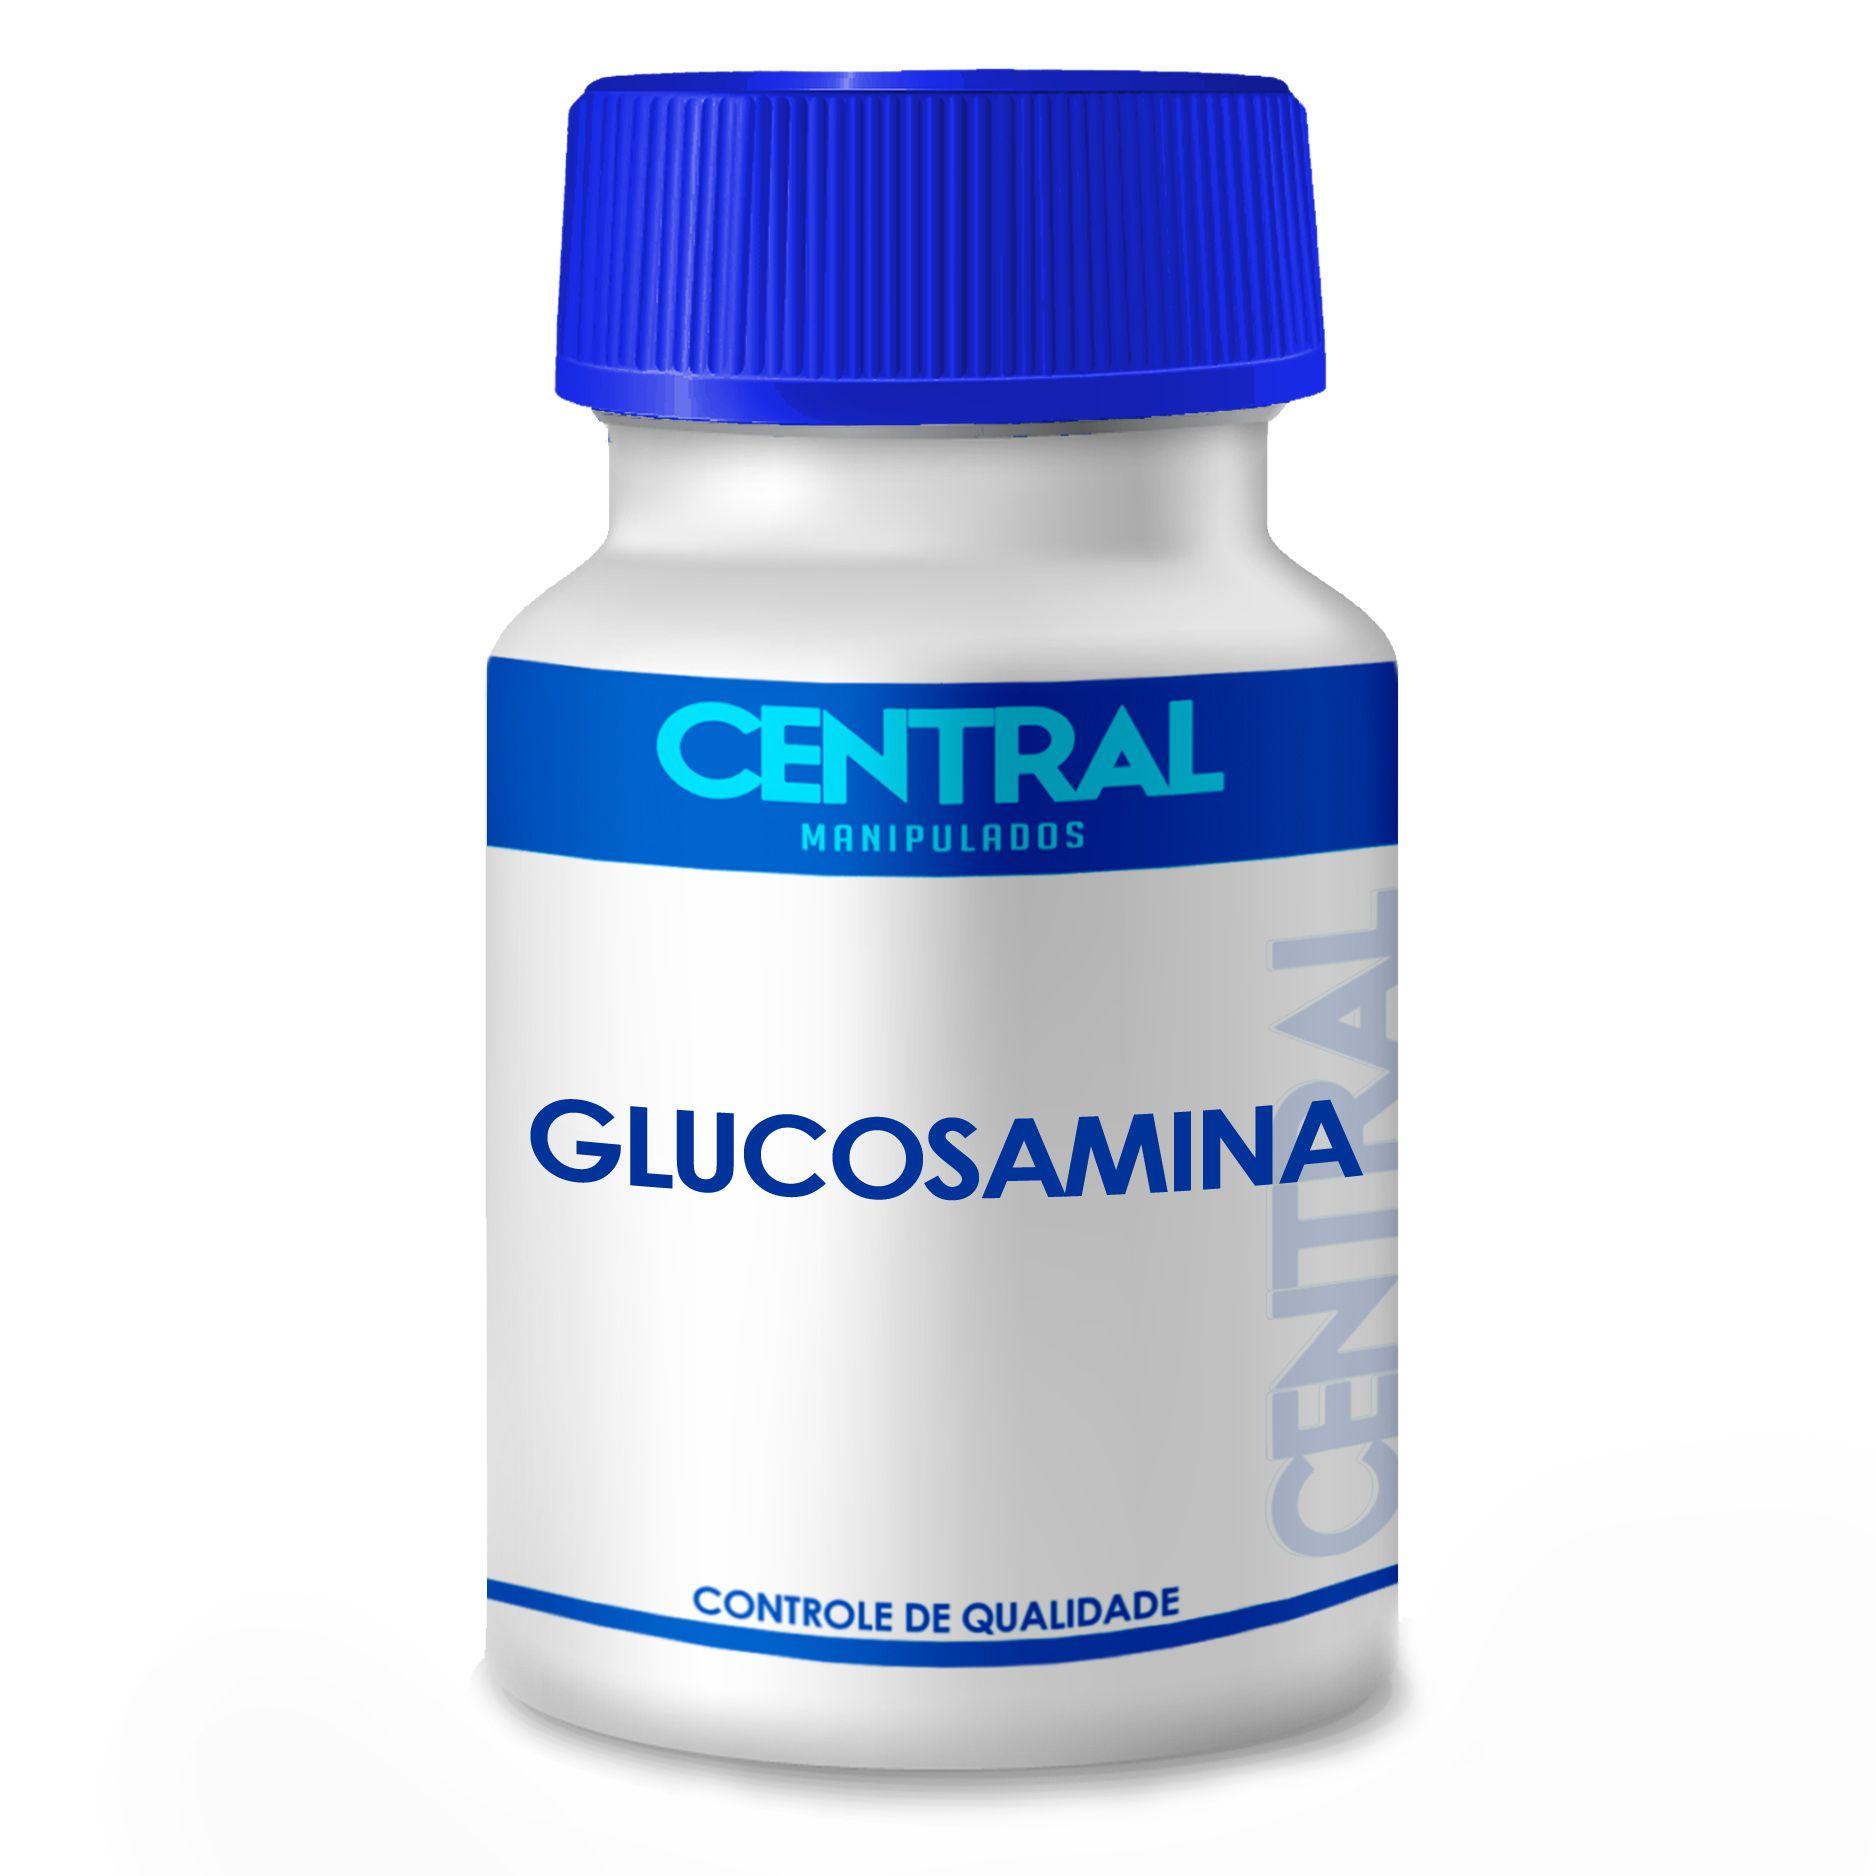 Glucosamina - tratamento de artrose ou osteoartrite 500mg 180 cápsulas